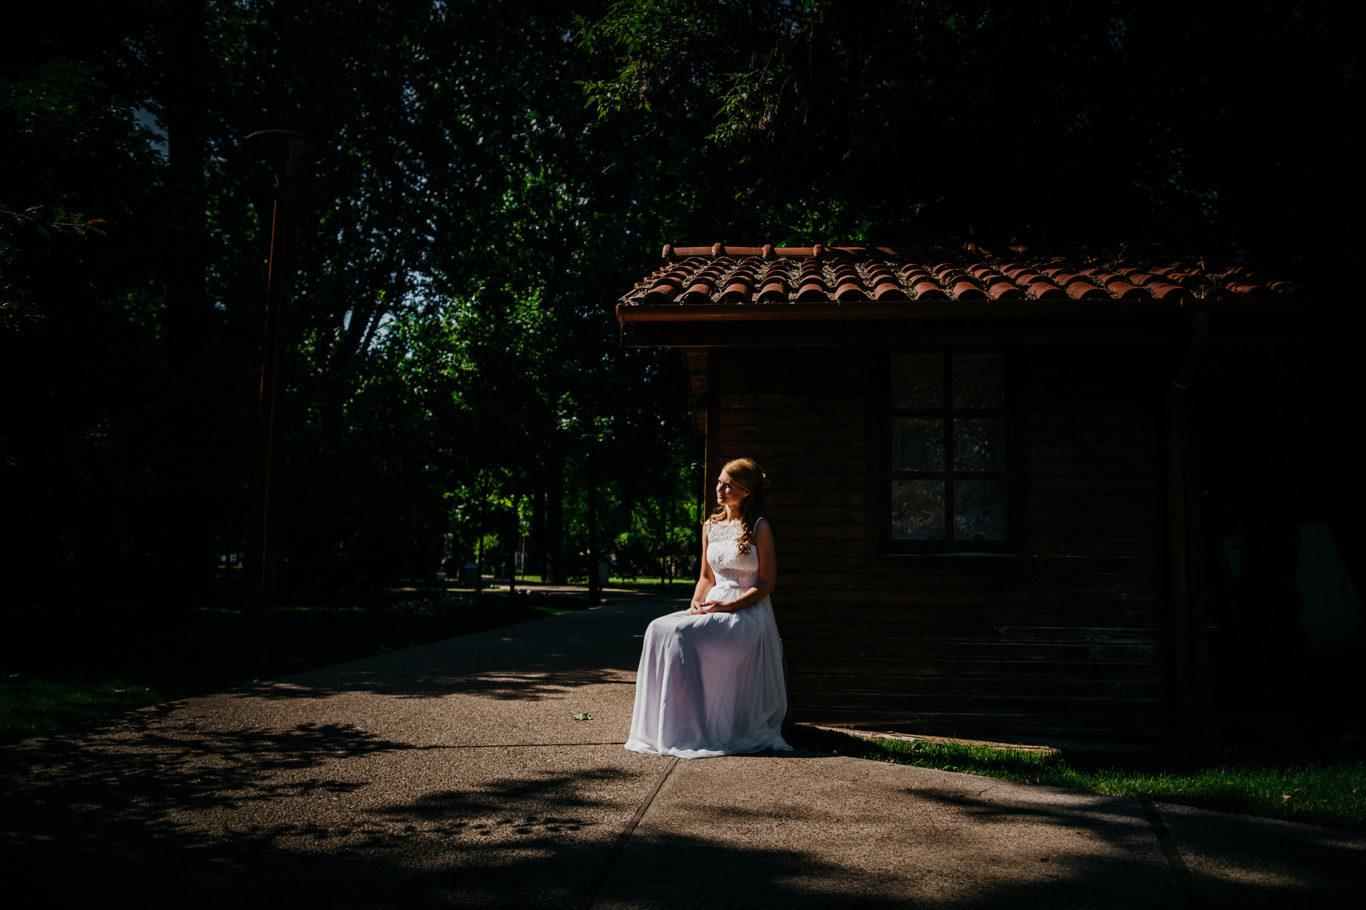 0176-fotografie-nunta-bucuresti-rodica-rares-fotograf-ciprian-dumitrescu-dc1_0072